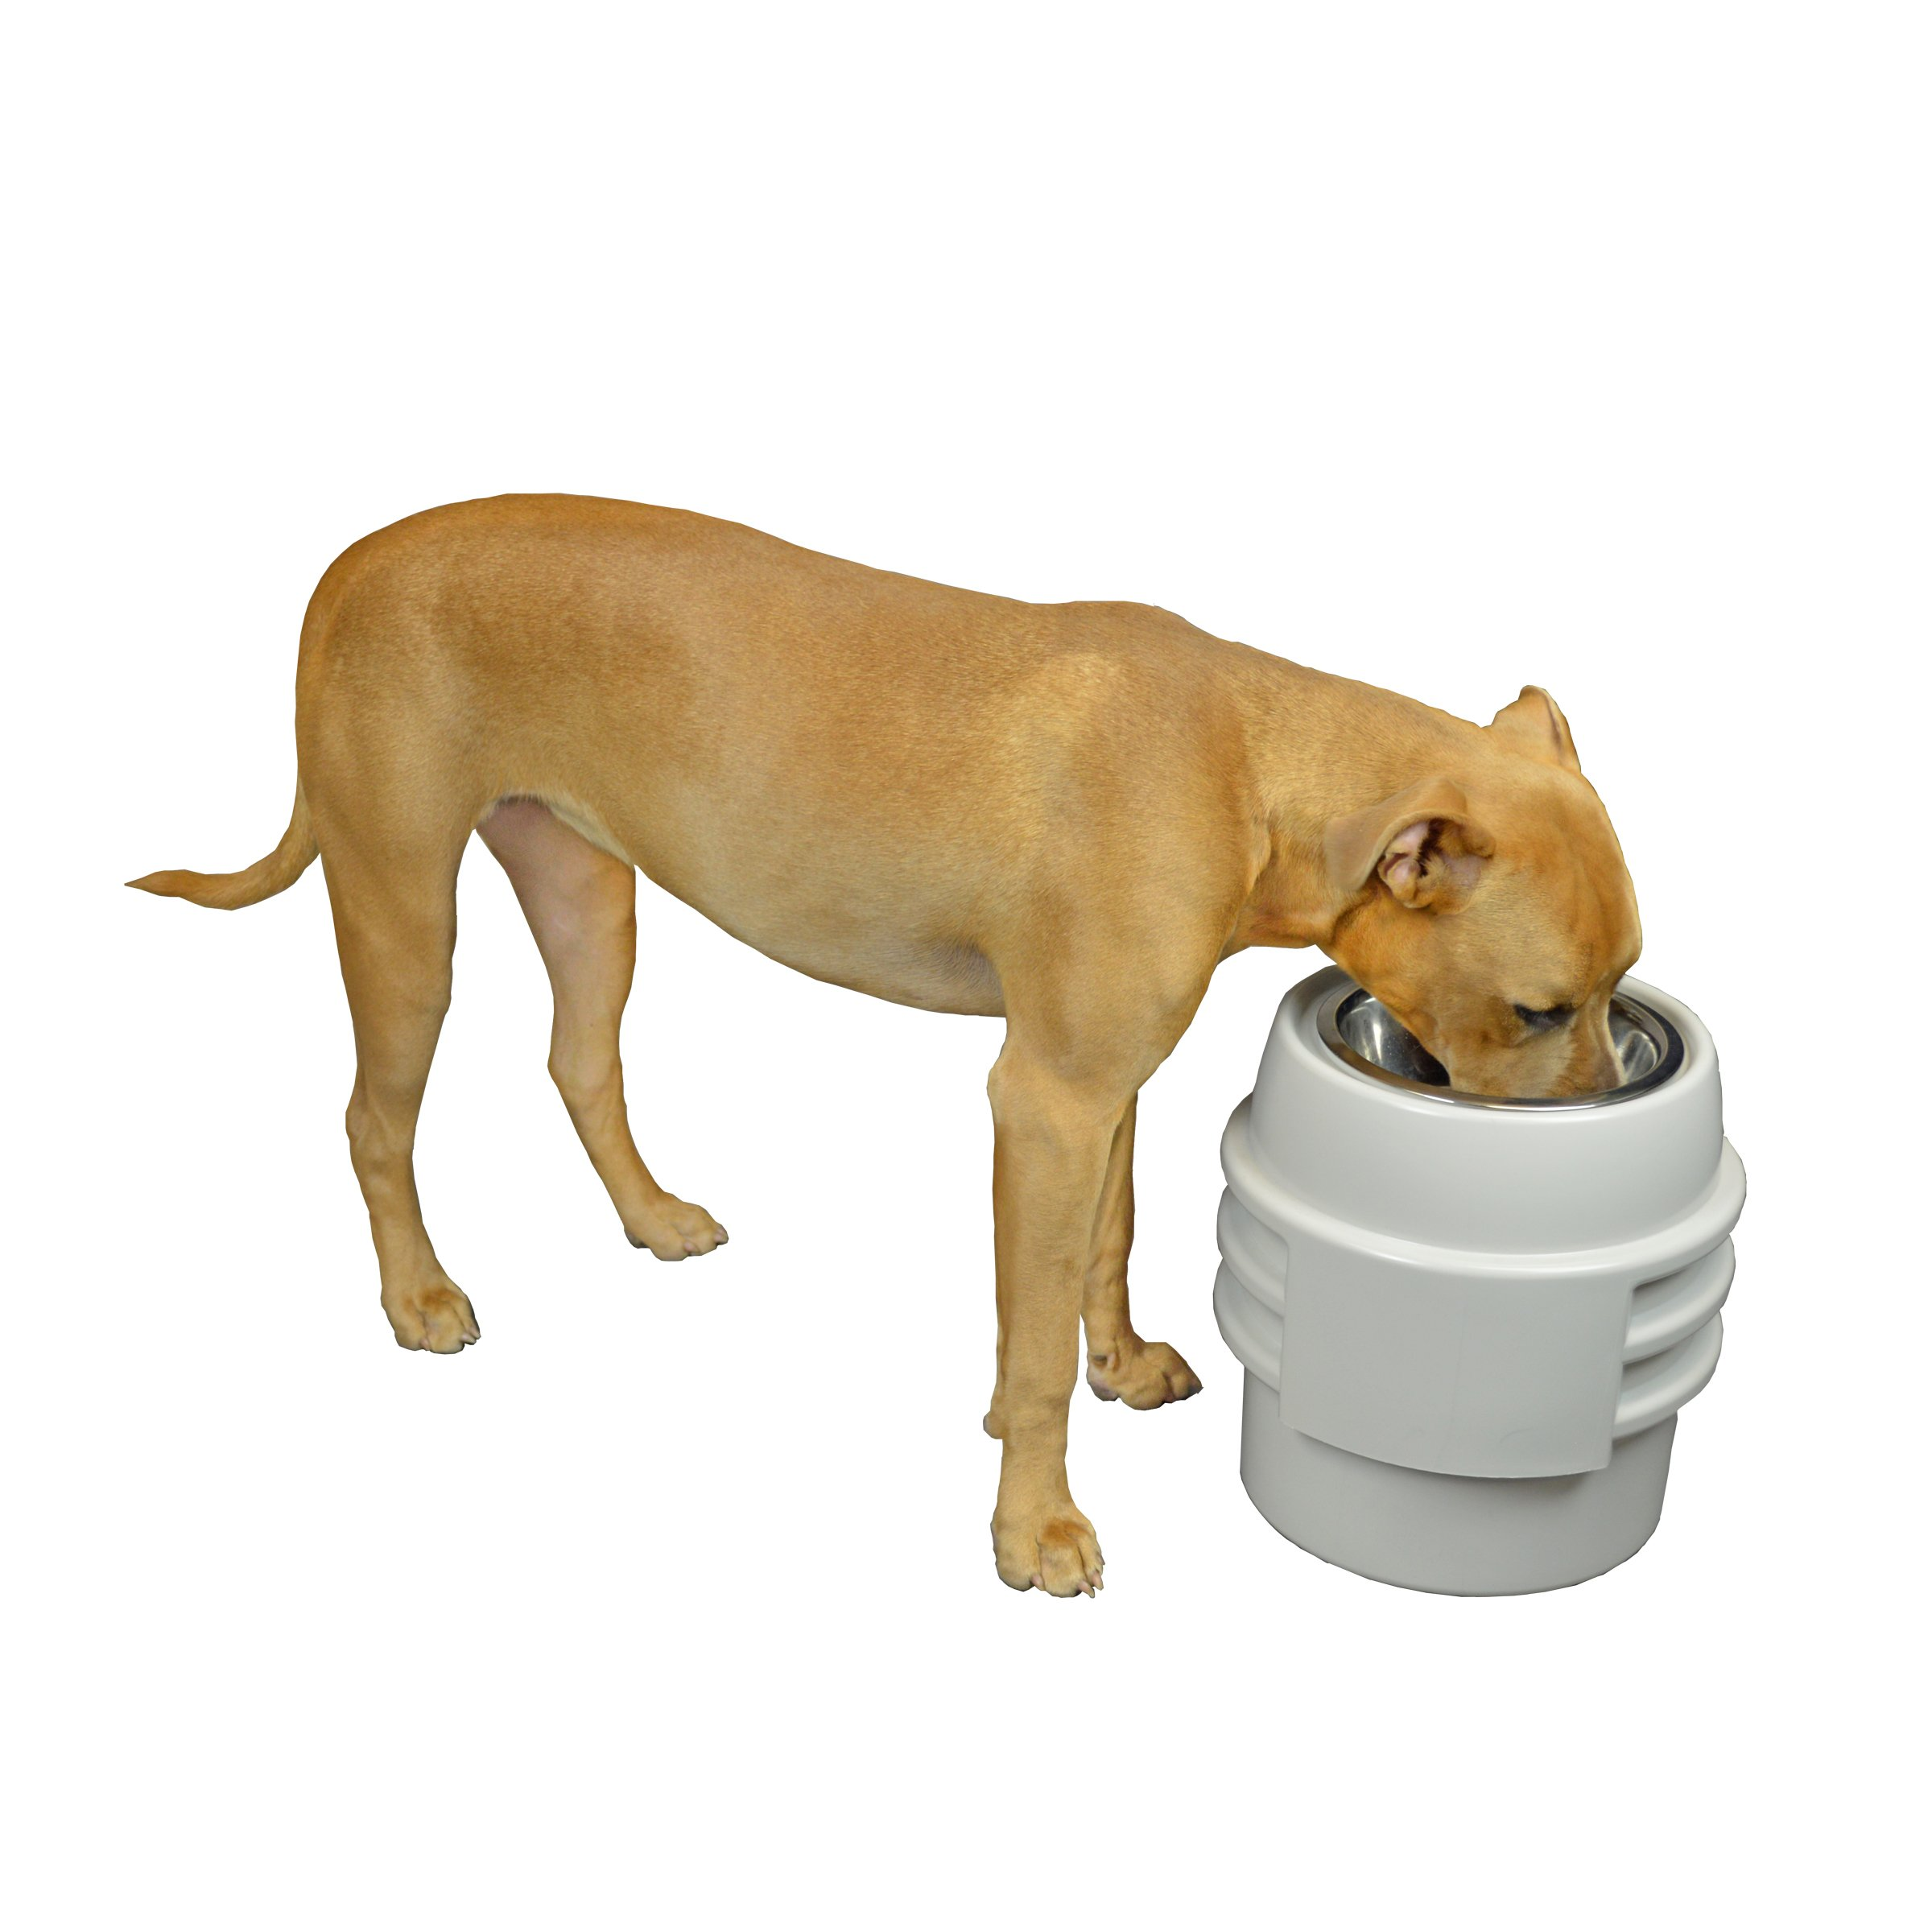 Our Pets Store-N- Feed Adjustable Raised Dog Bowl Feeder & Food Storage